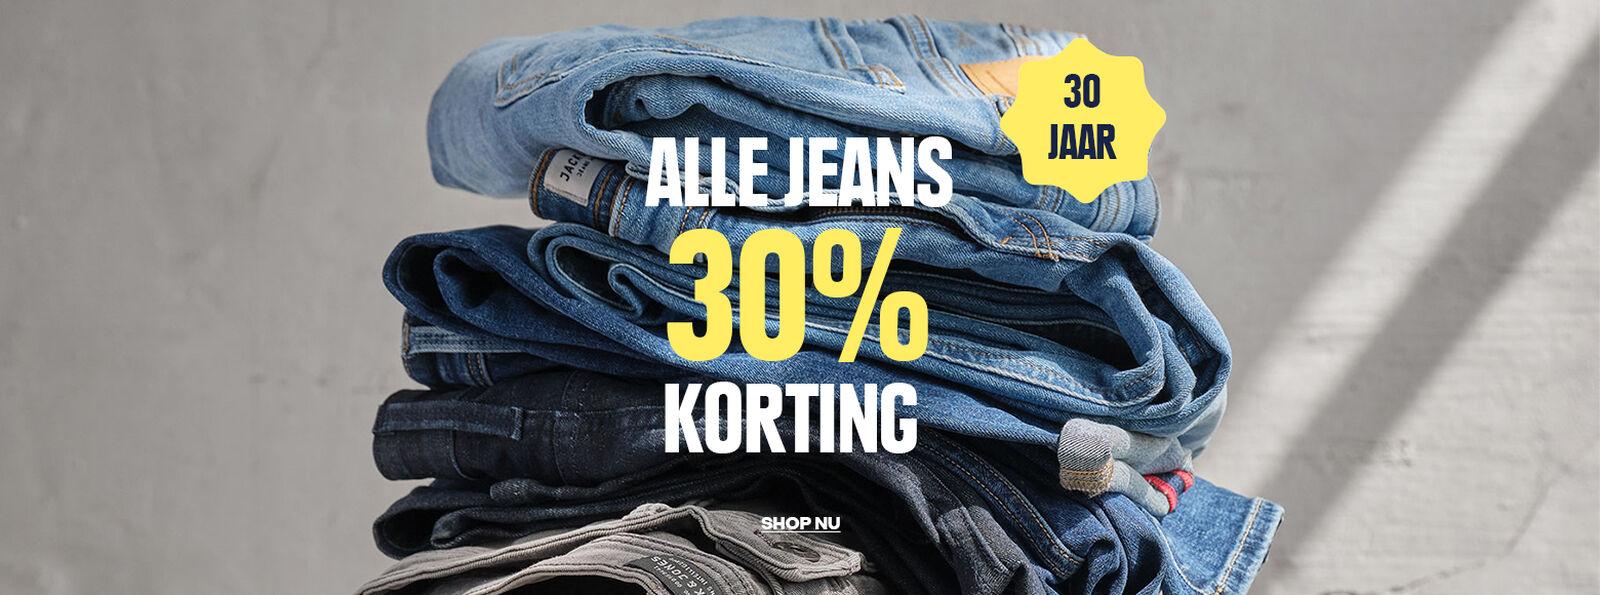 30% korting op alle Jeans